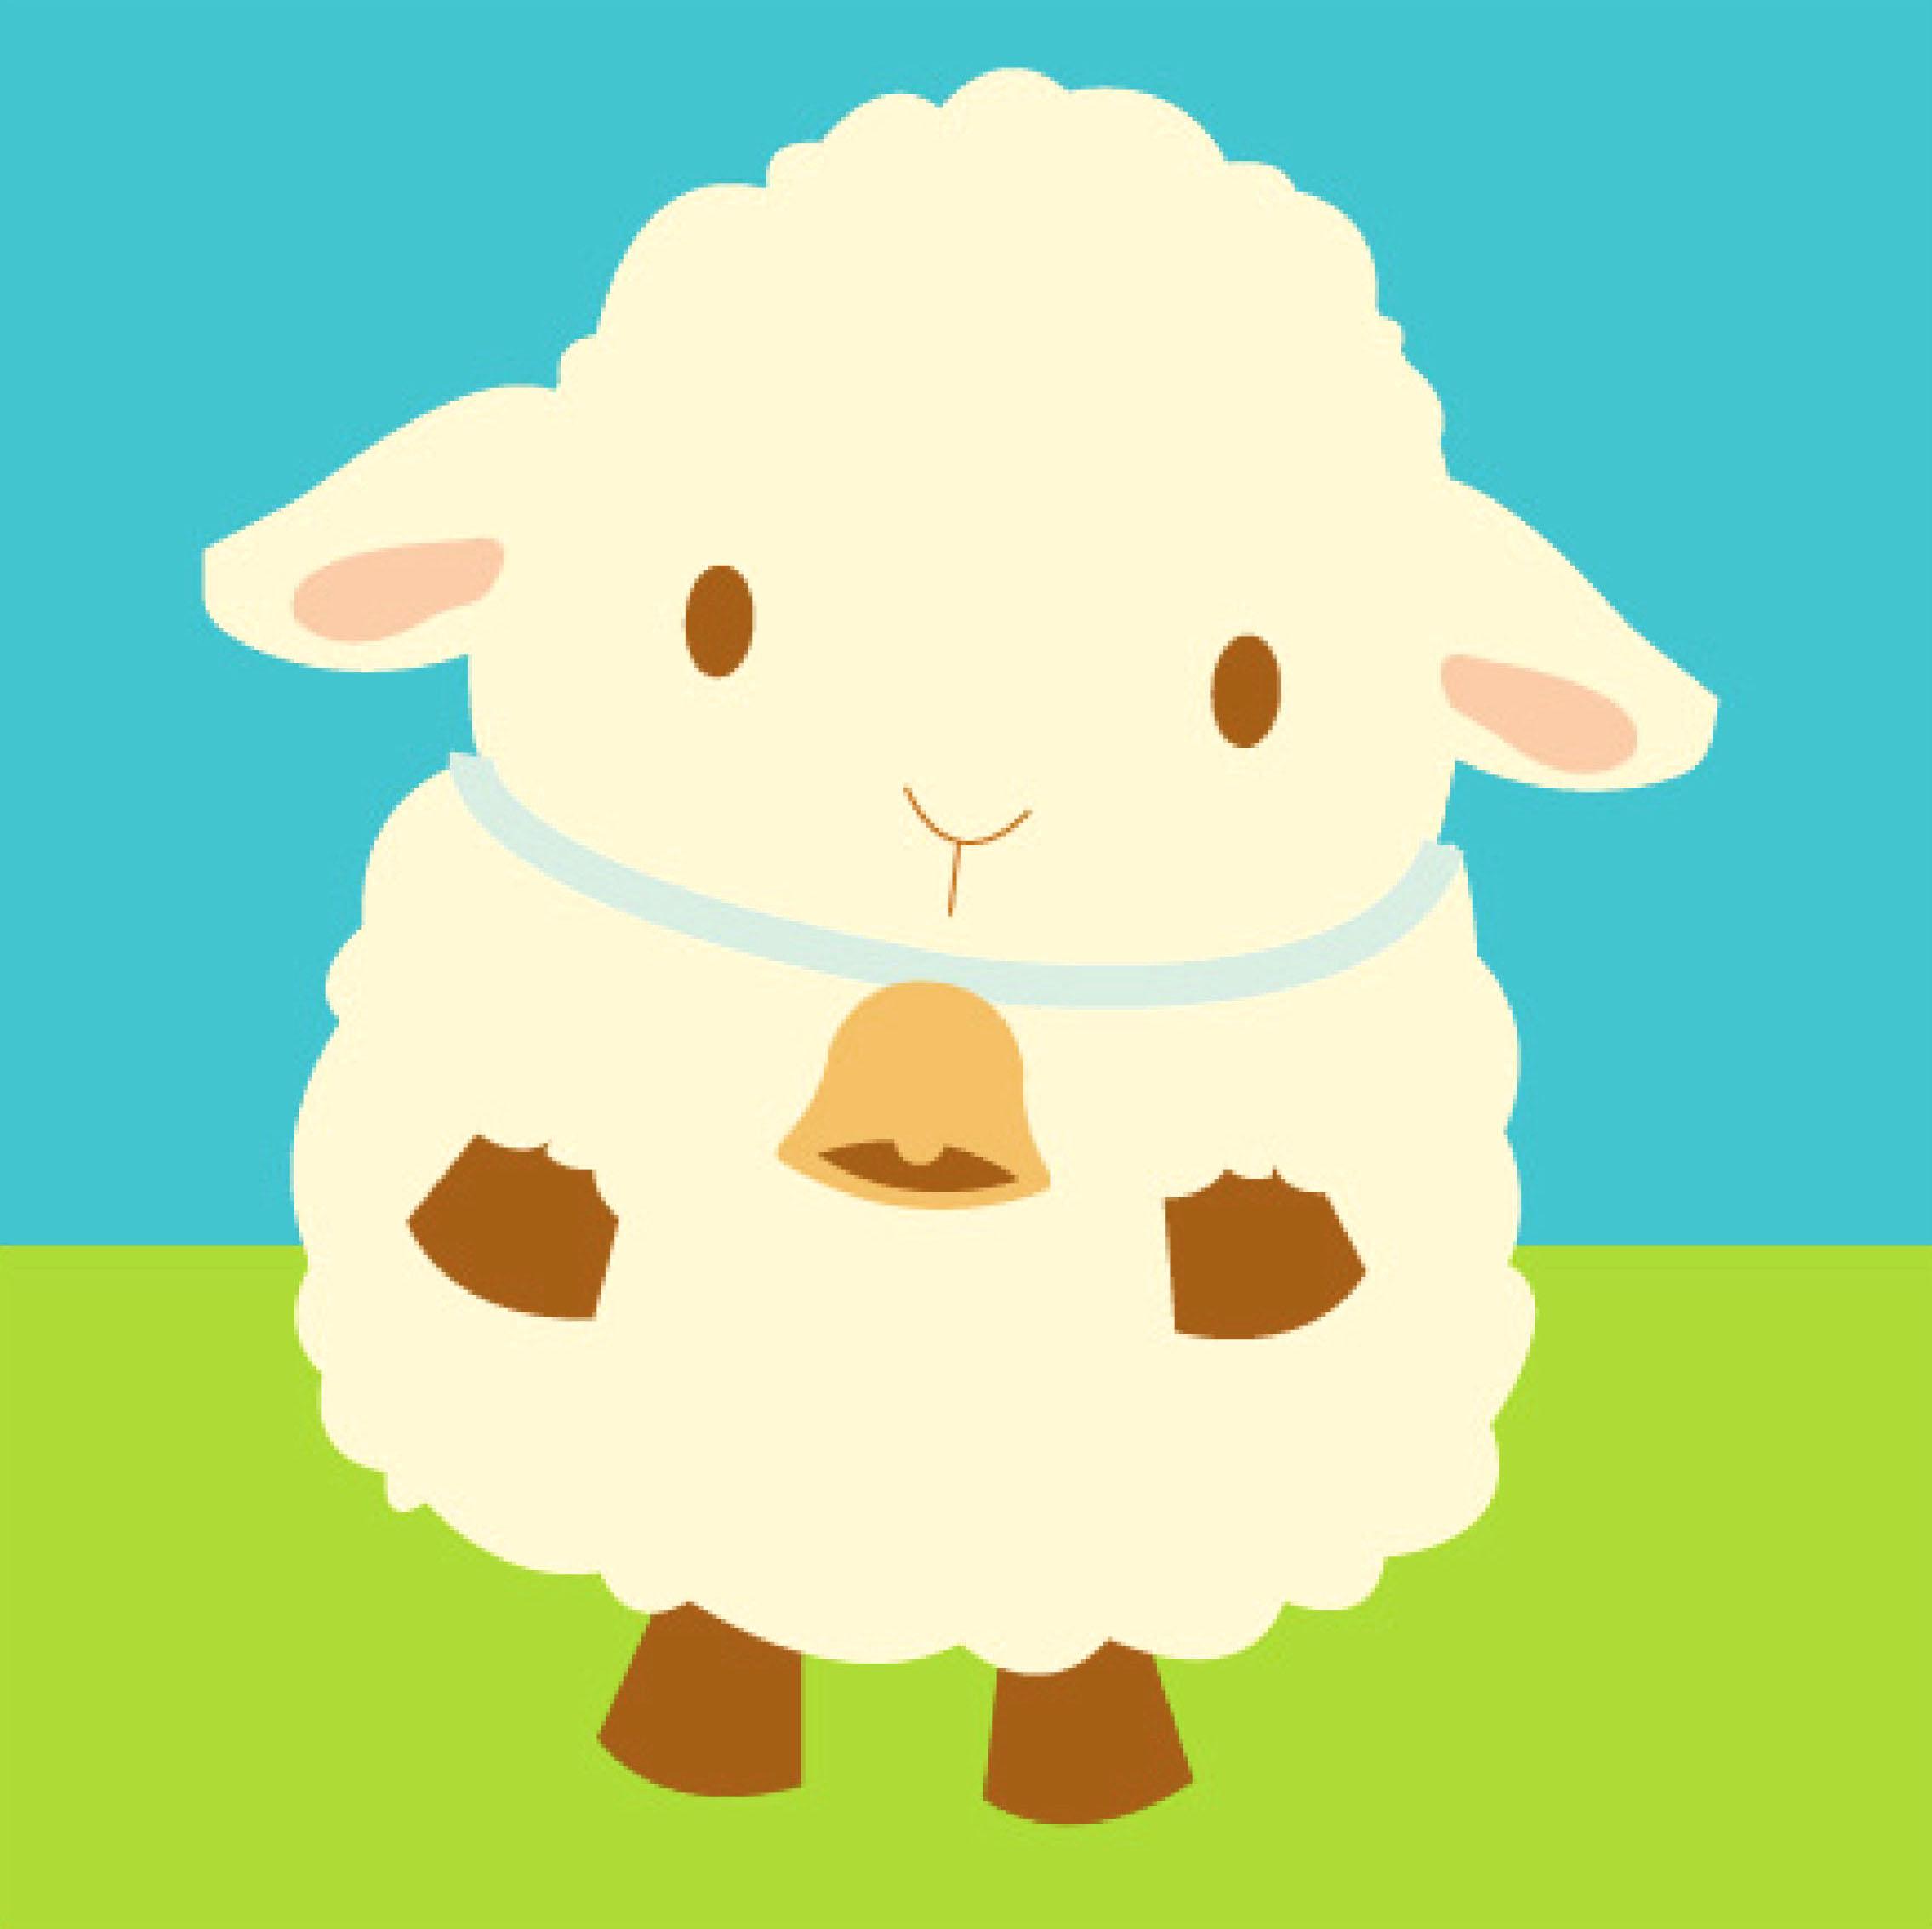 Free Lamb Image, Download Free Clip Art, Free Clip Art on ...